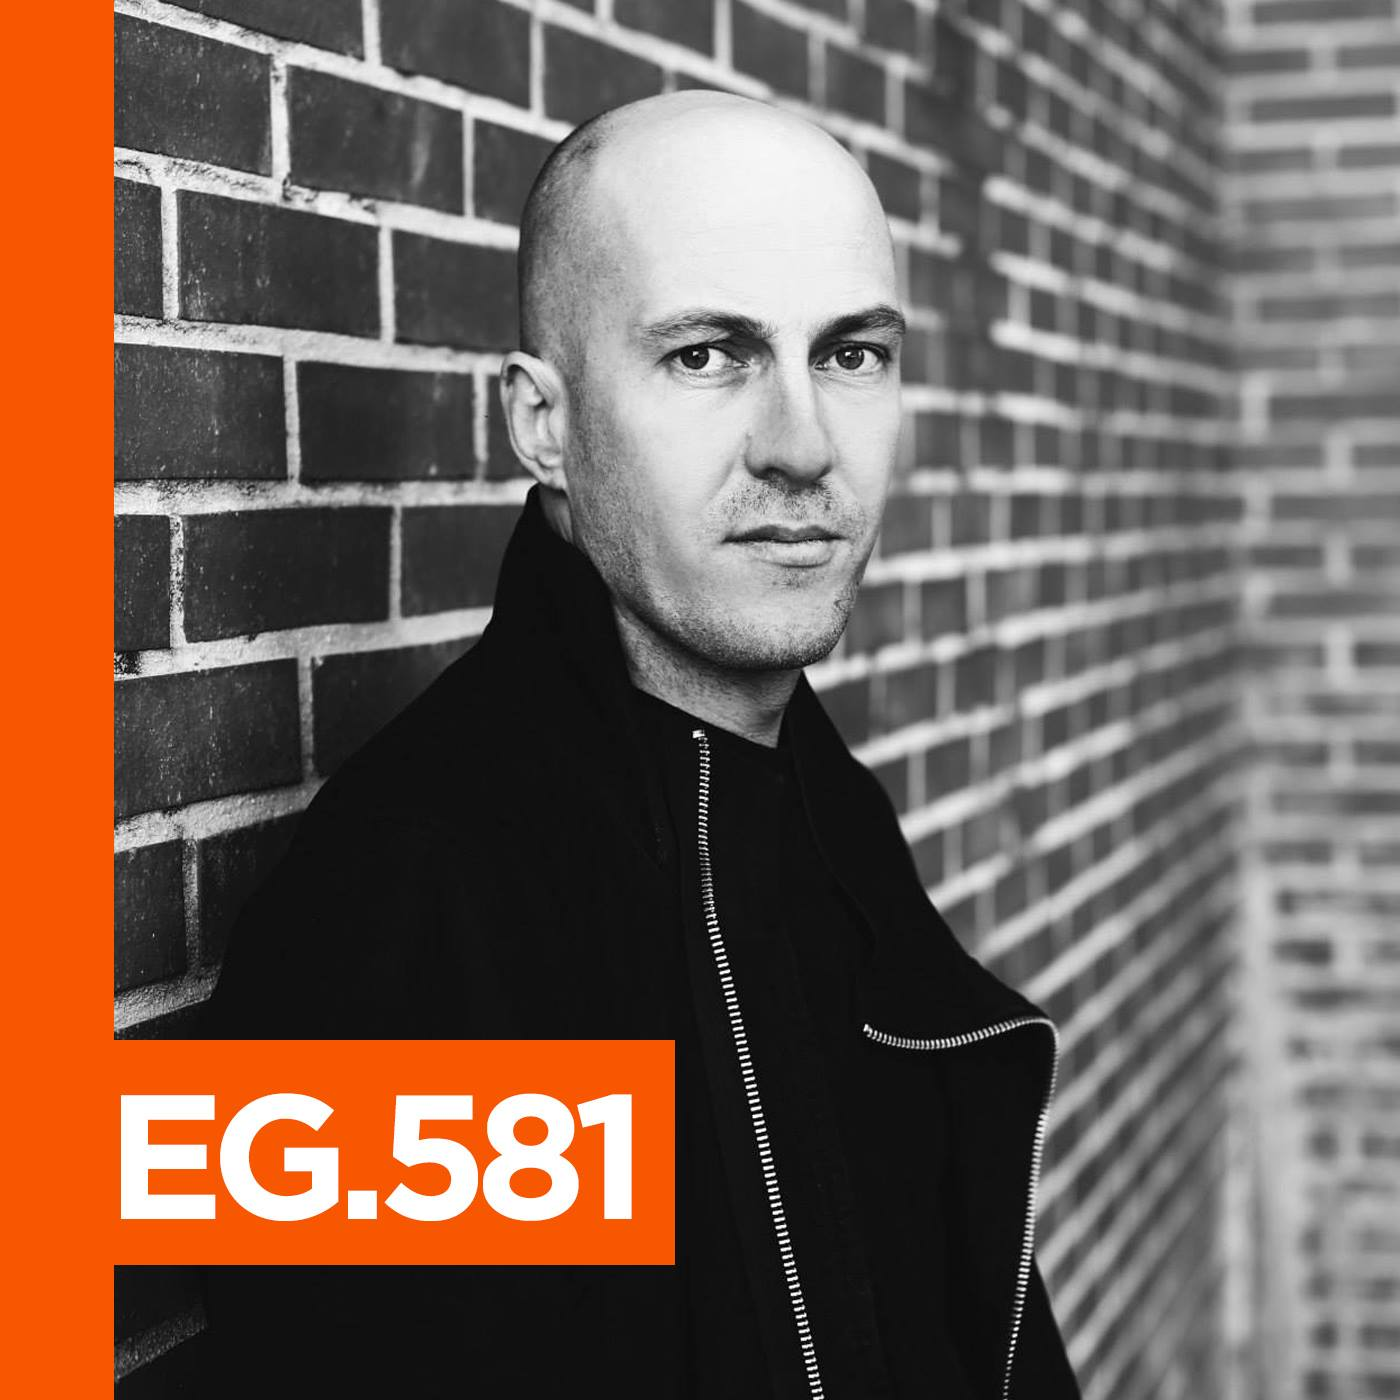 EG.581 Julian Jeweil (Sonar Special)